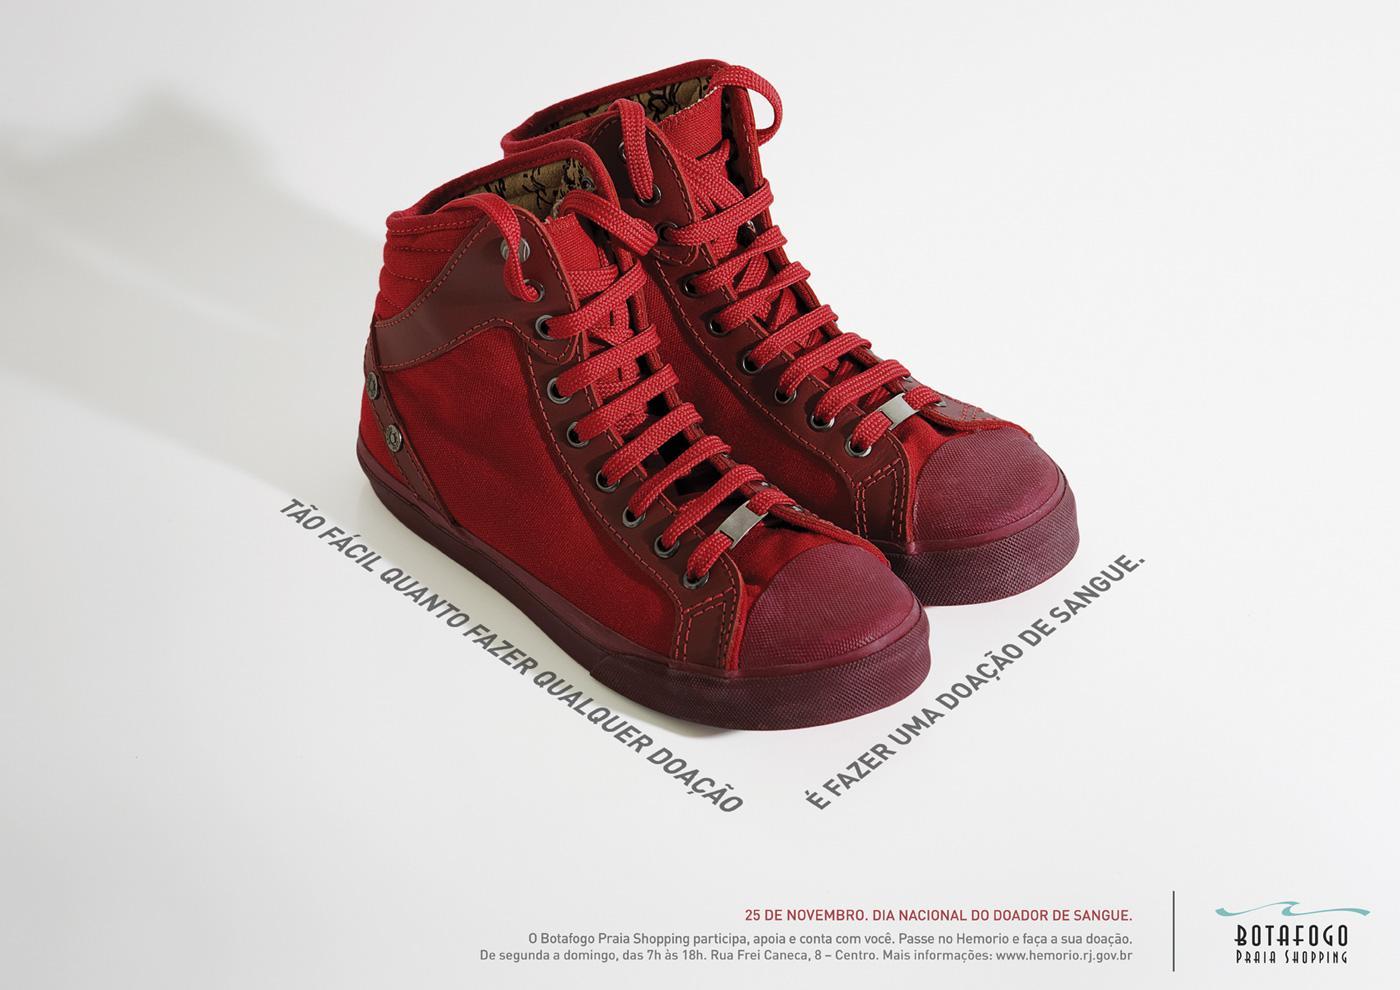 Botafogo Praia Shopping Print Ad -  Donate Blood, Boots